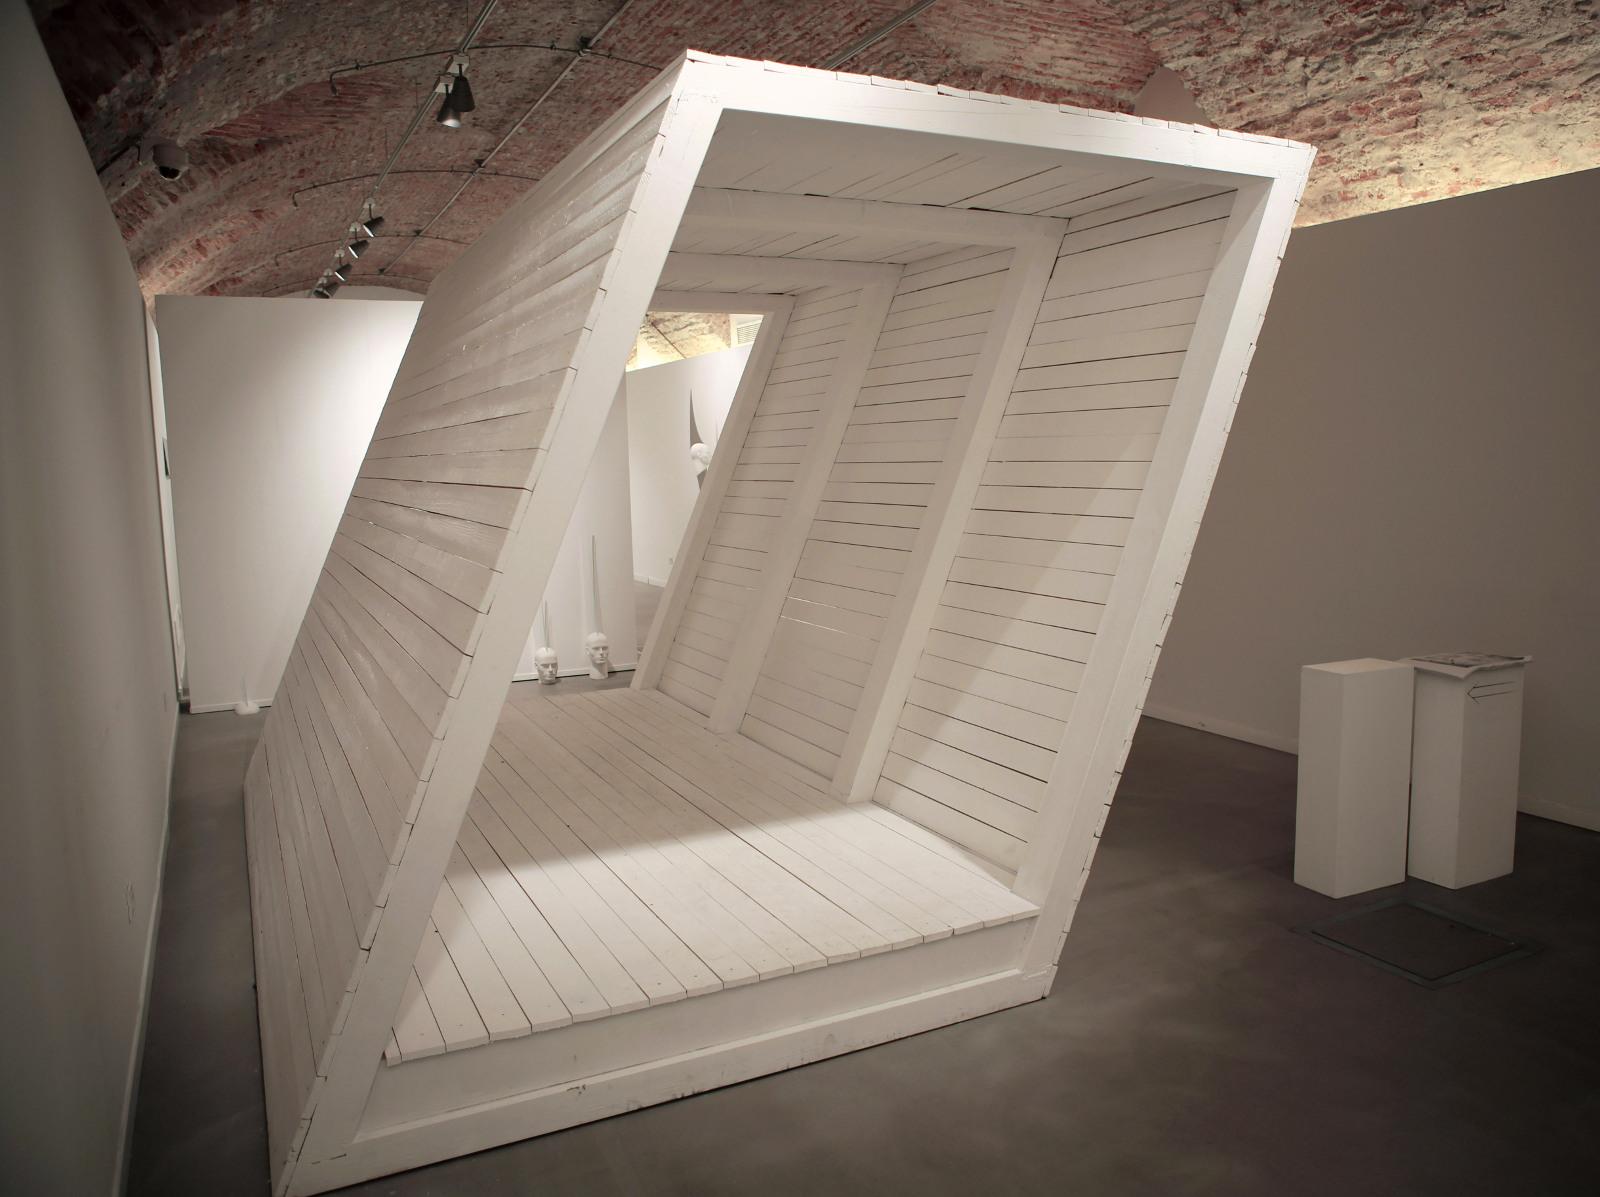 Decoditunnel - 23 7 3 1 - Stefano Russo